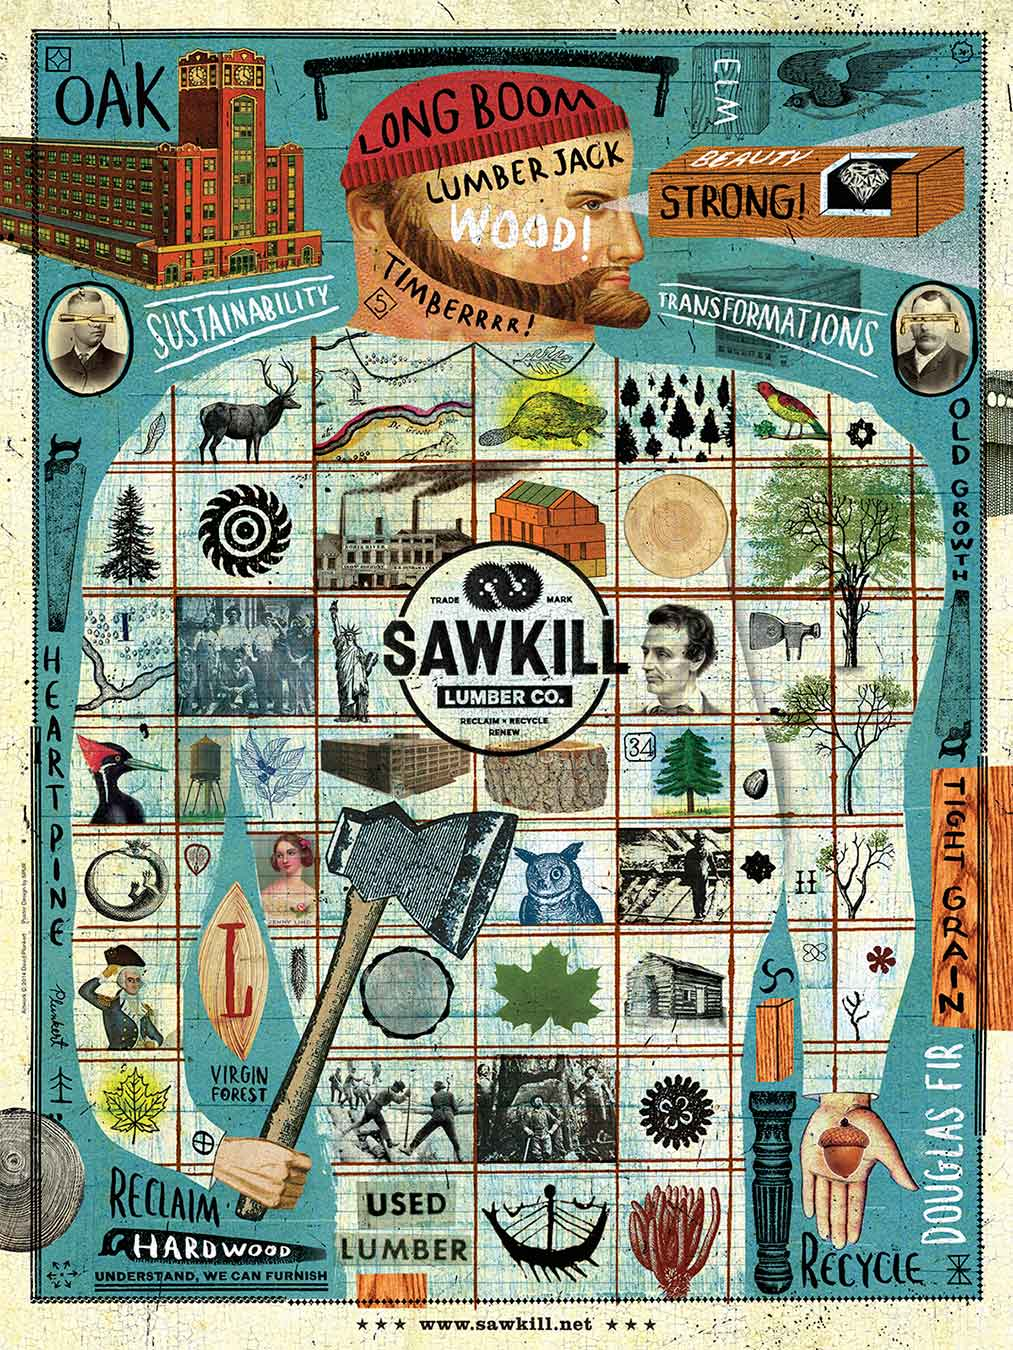 David Plunkert / Lumberjack / Sawkill Lumber Company